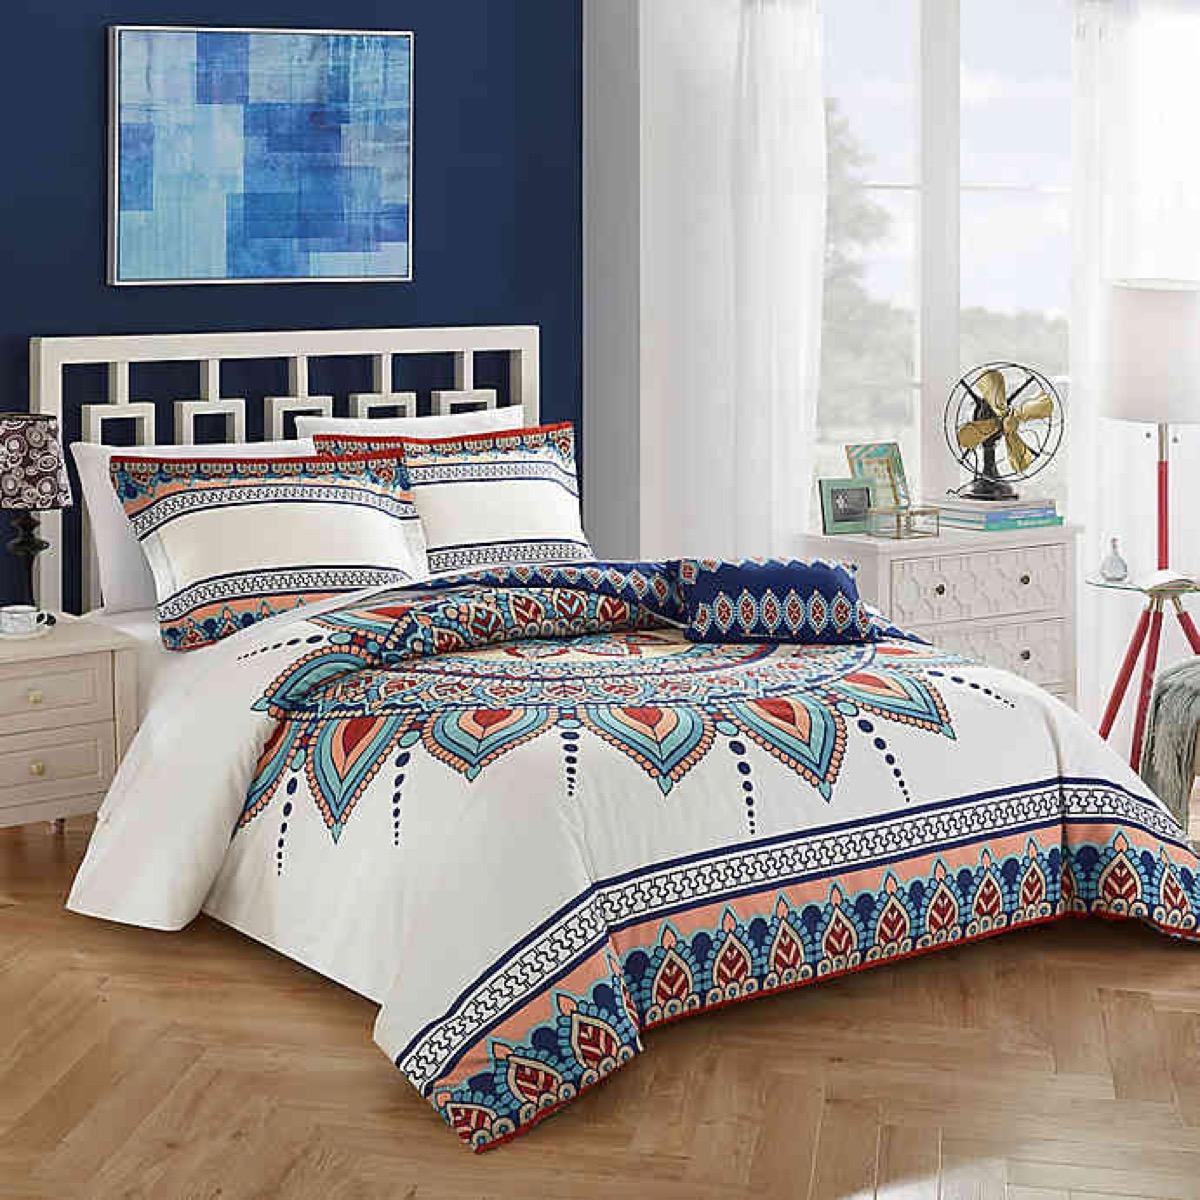 Reversible bedding